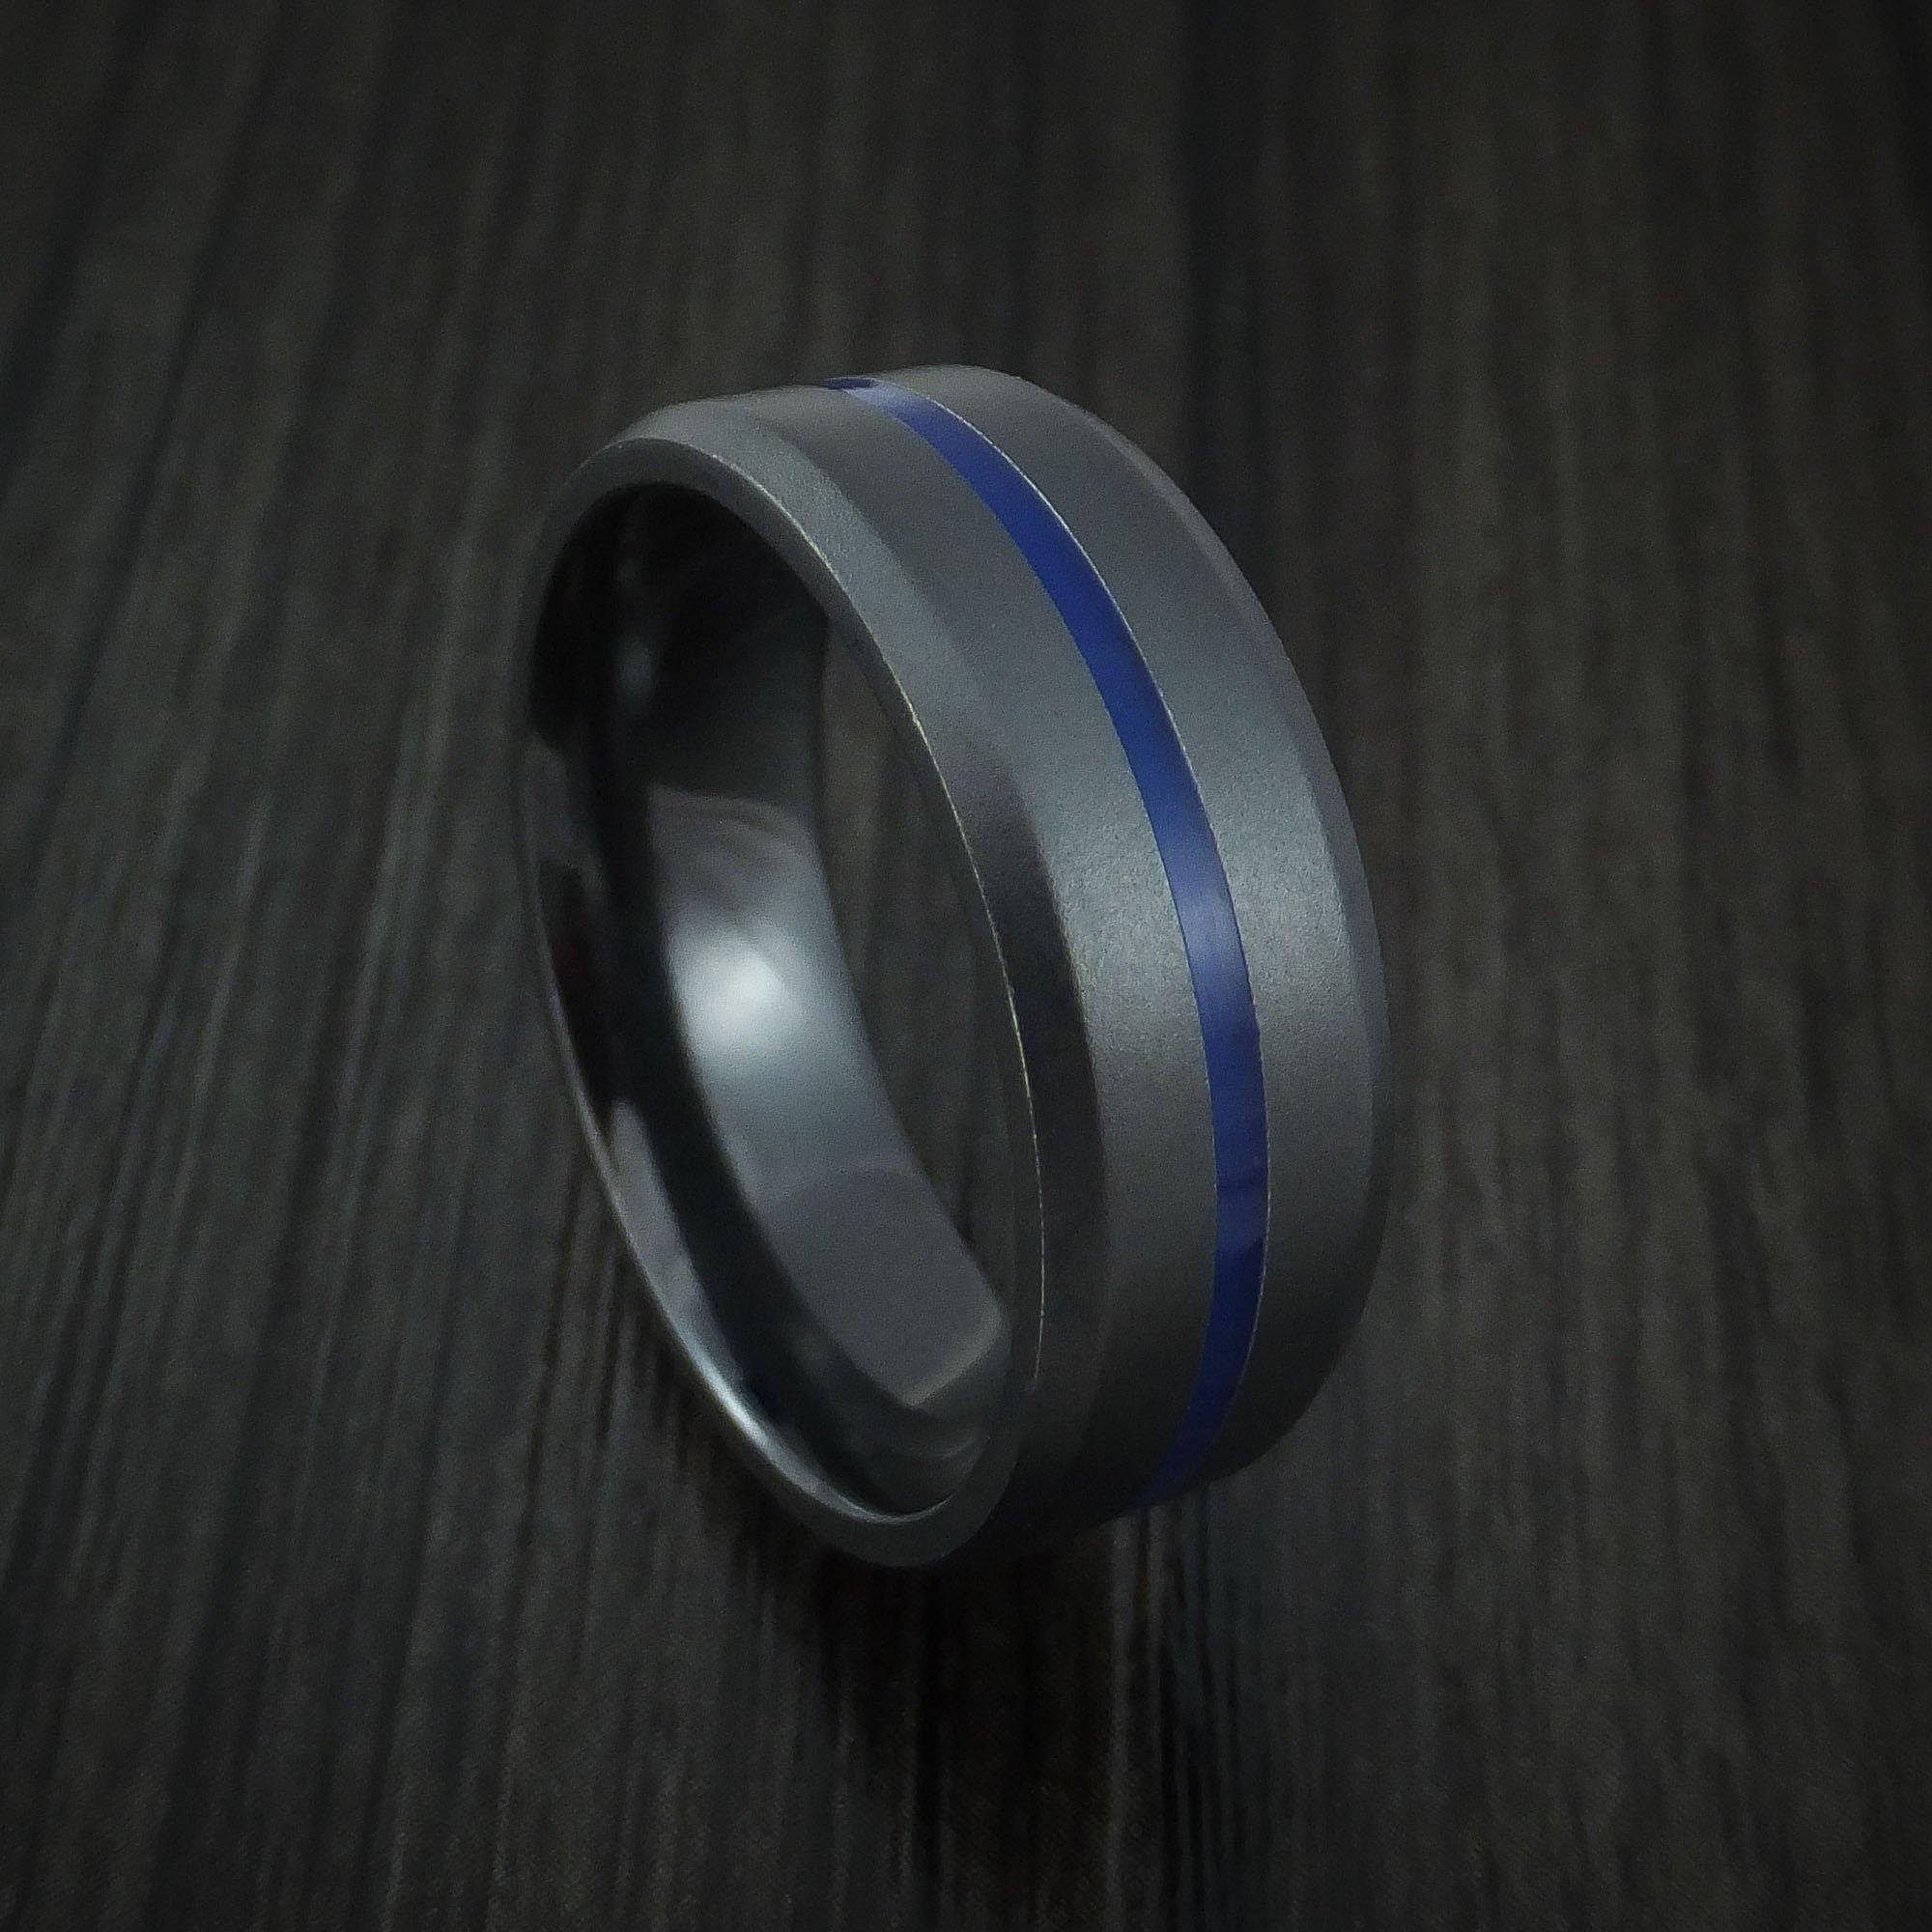 Black Zirconium Ring with Center Blue Inlay Thin Blue Line Wedding Band Genuine Craftsmanship